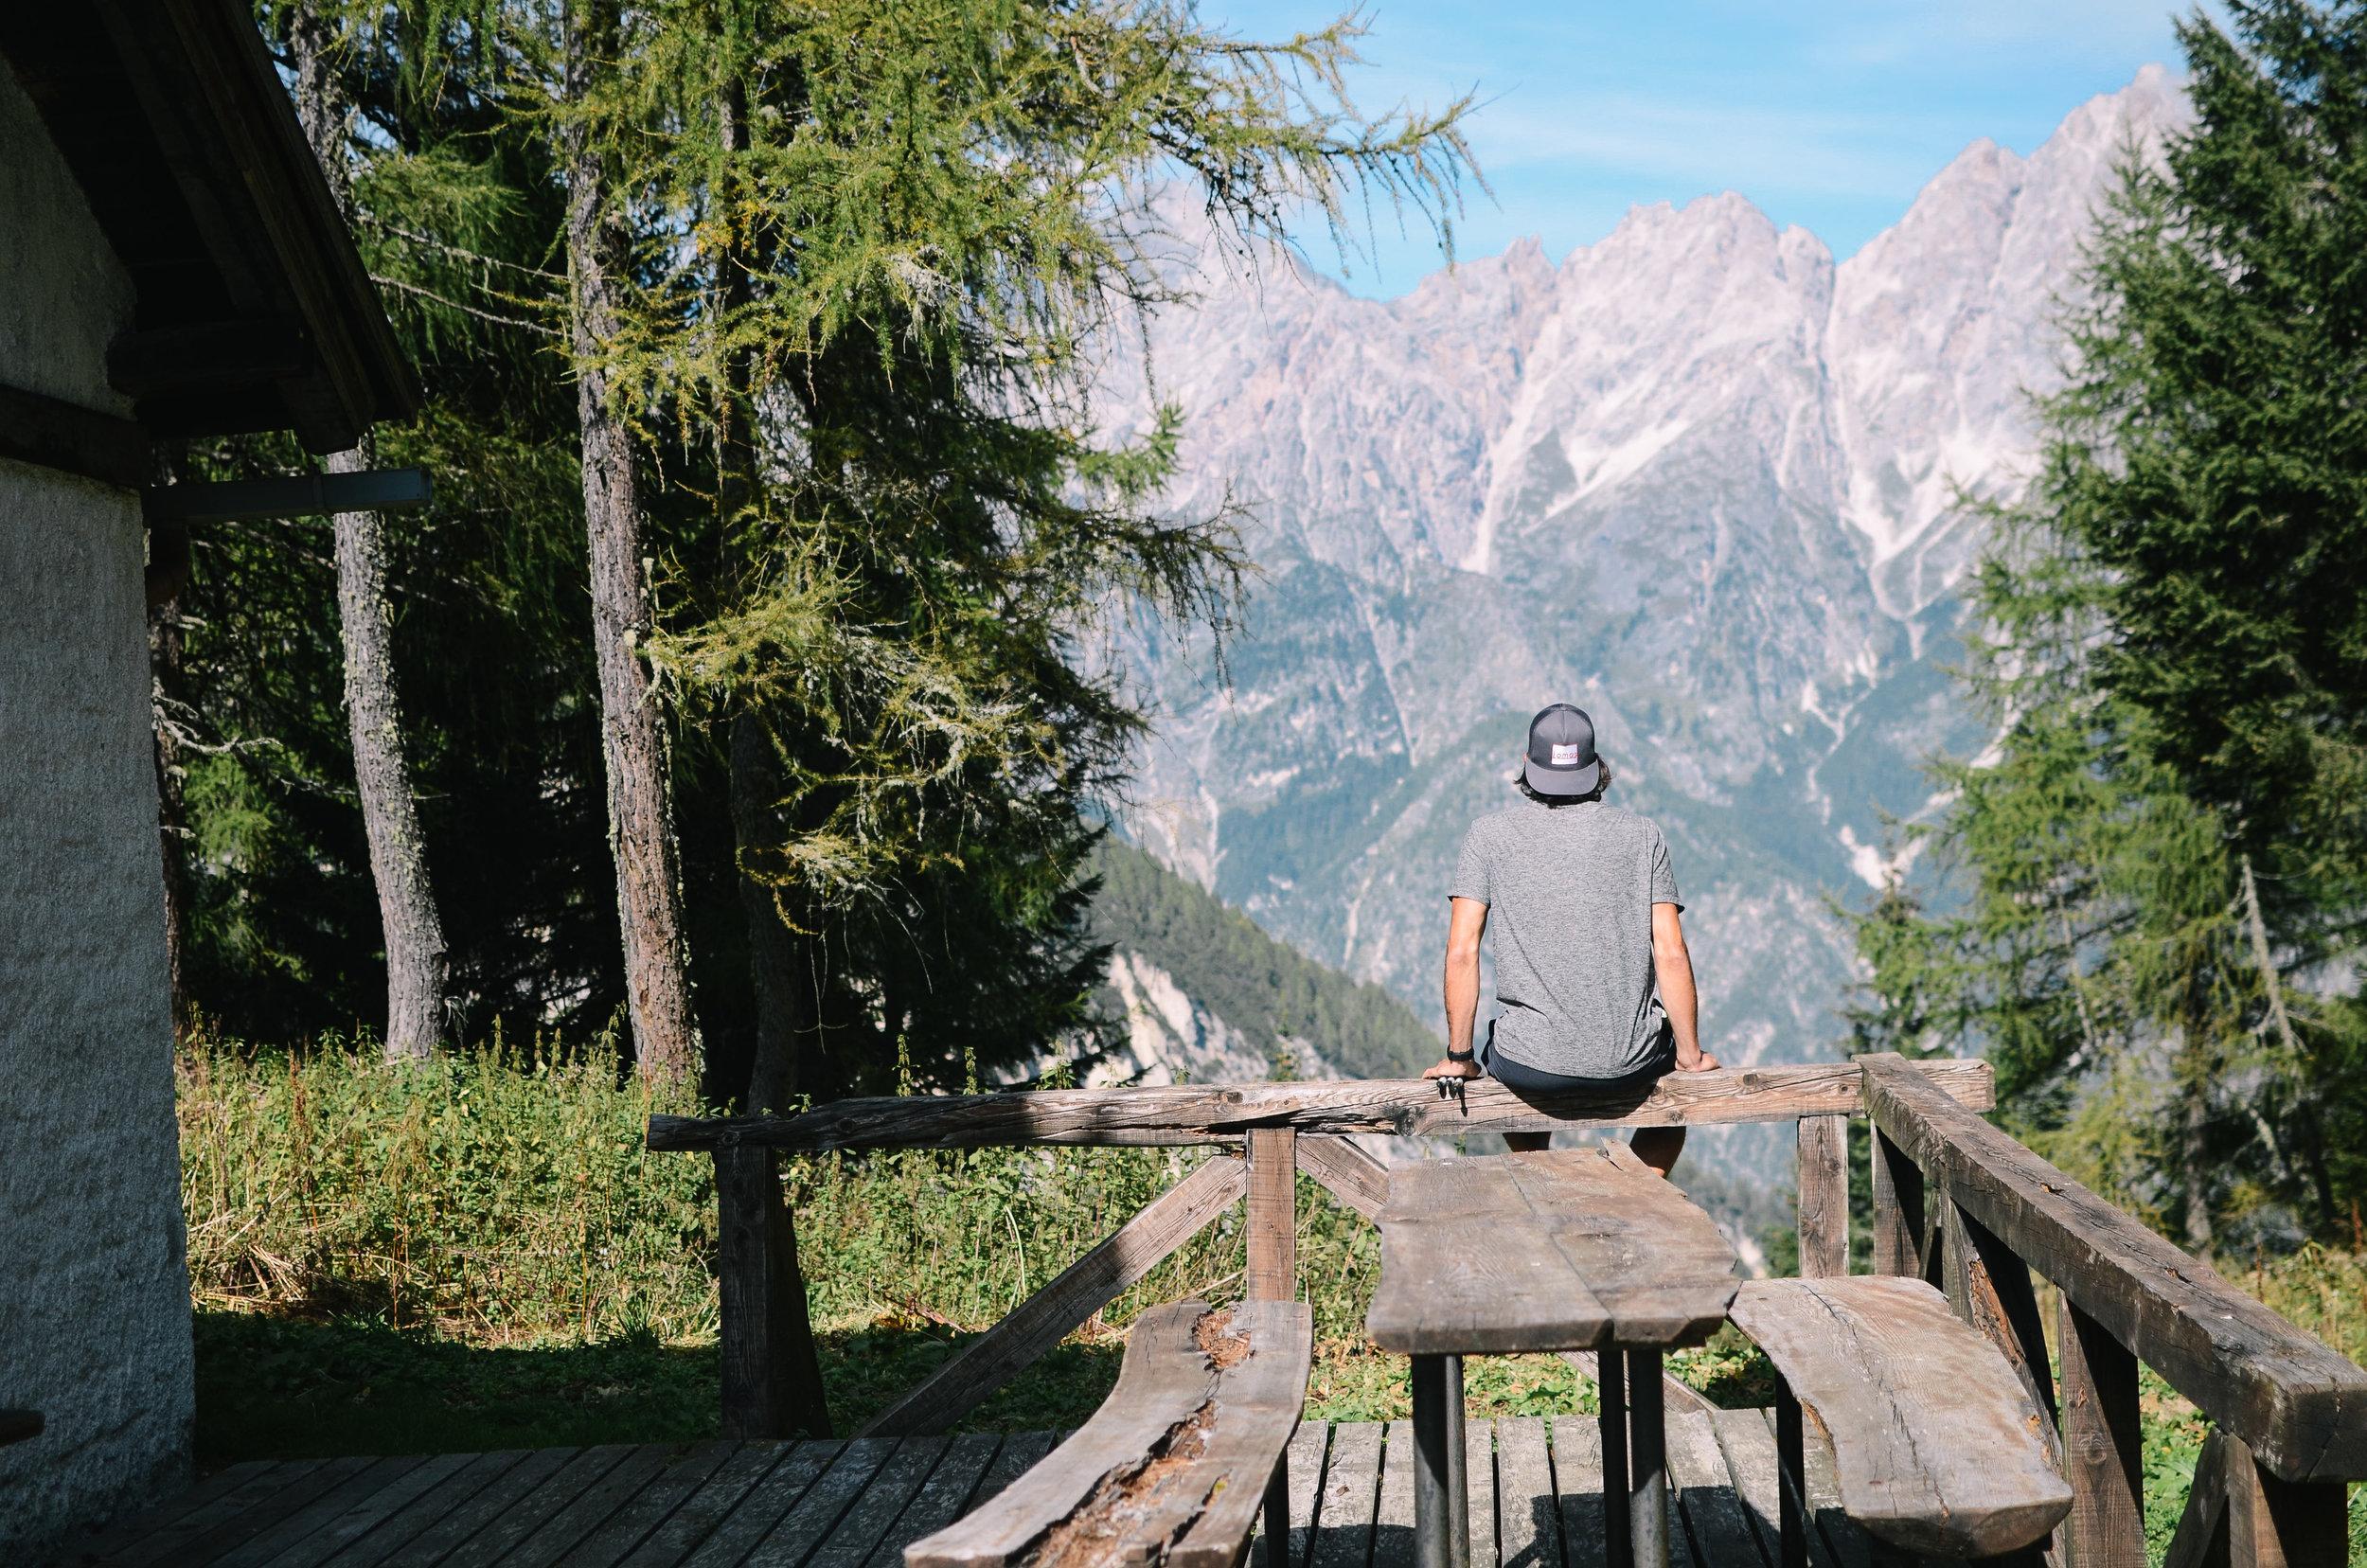 adventure-in-italy-3-hikes-dolomites-hiking-travel-blog-tyrol-4.jpg